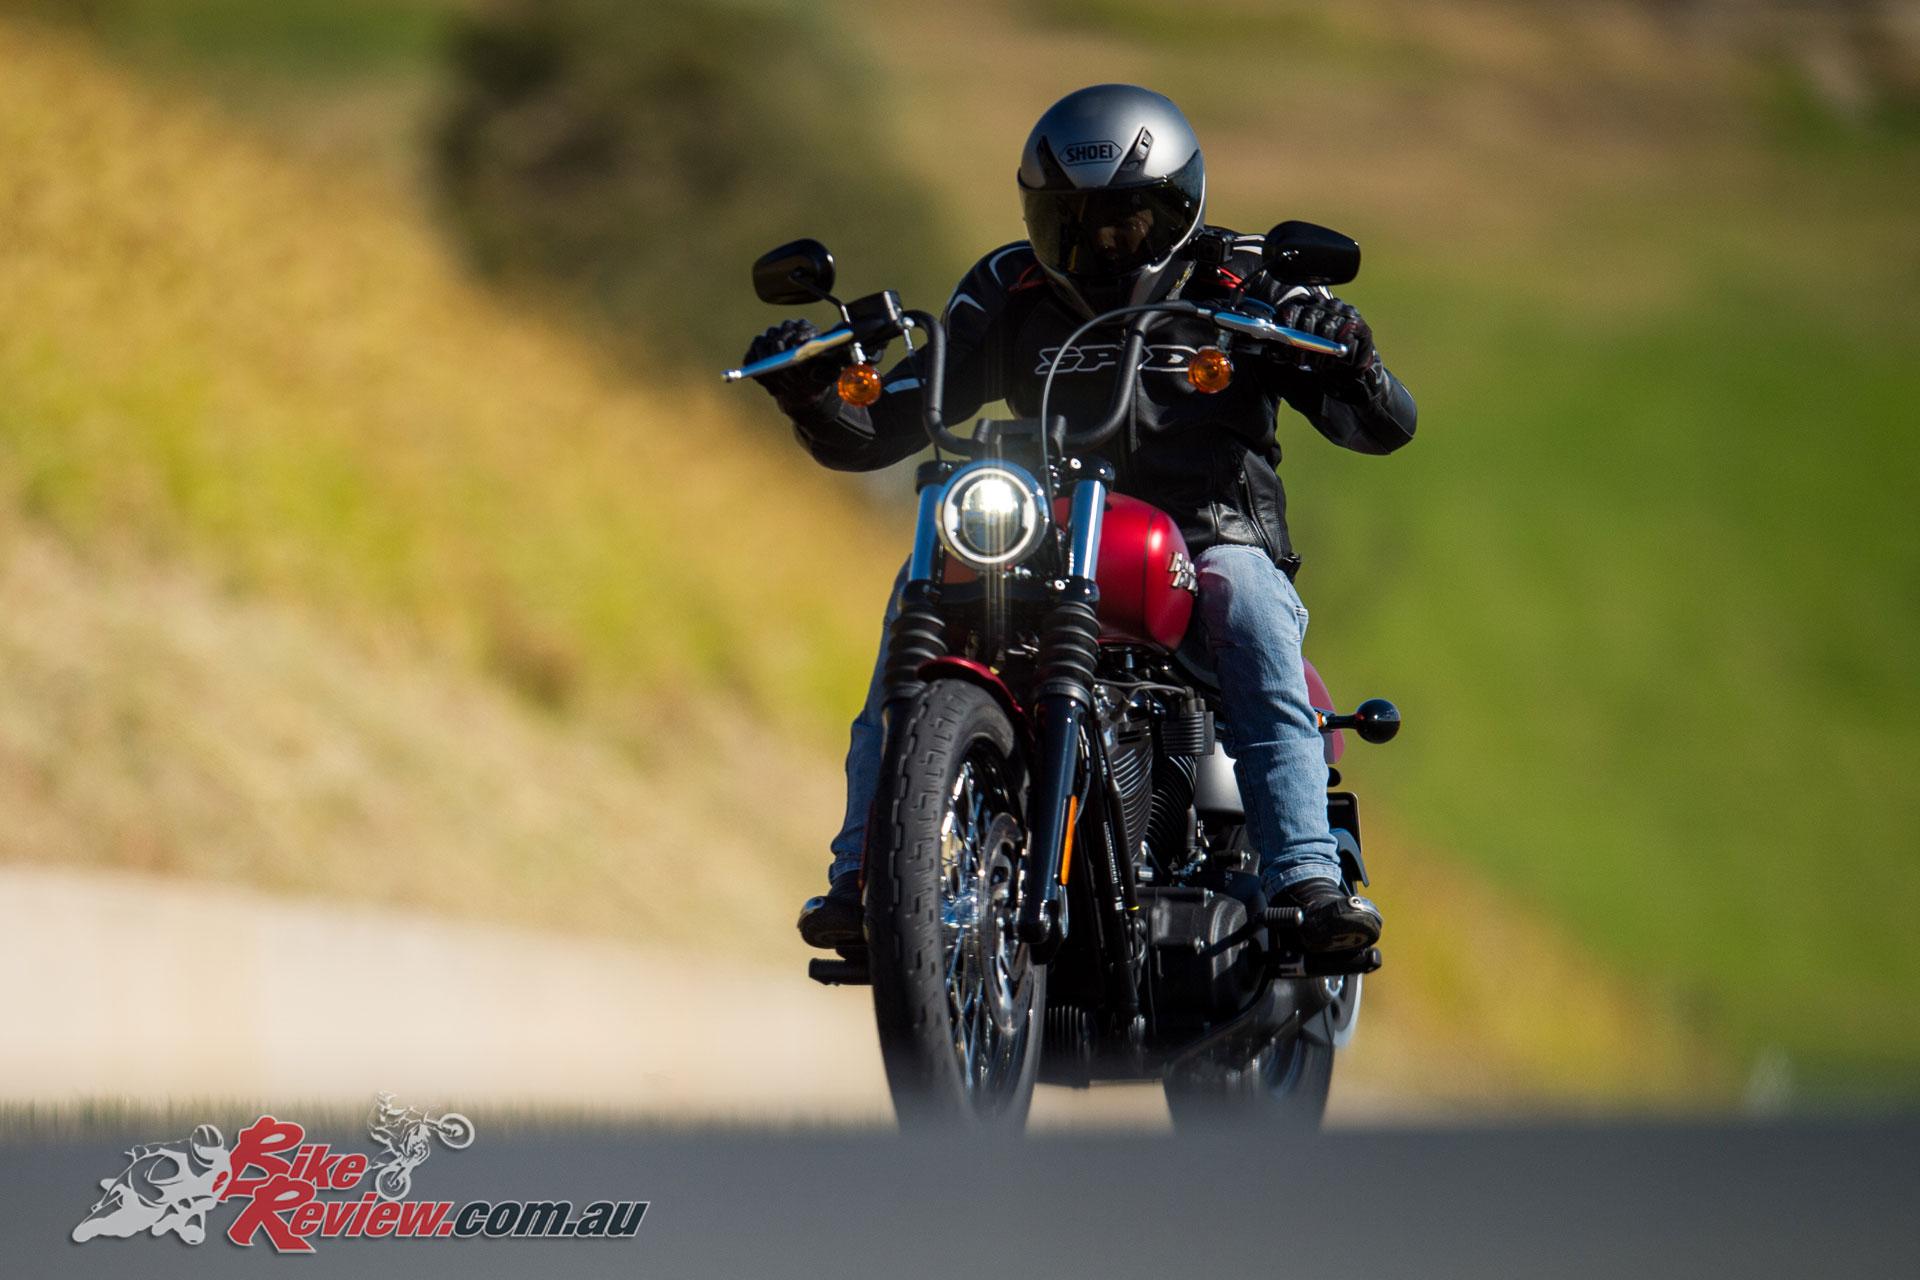 2019 Harley-Davidson Softail Tour - Street Bob